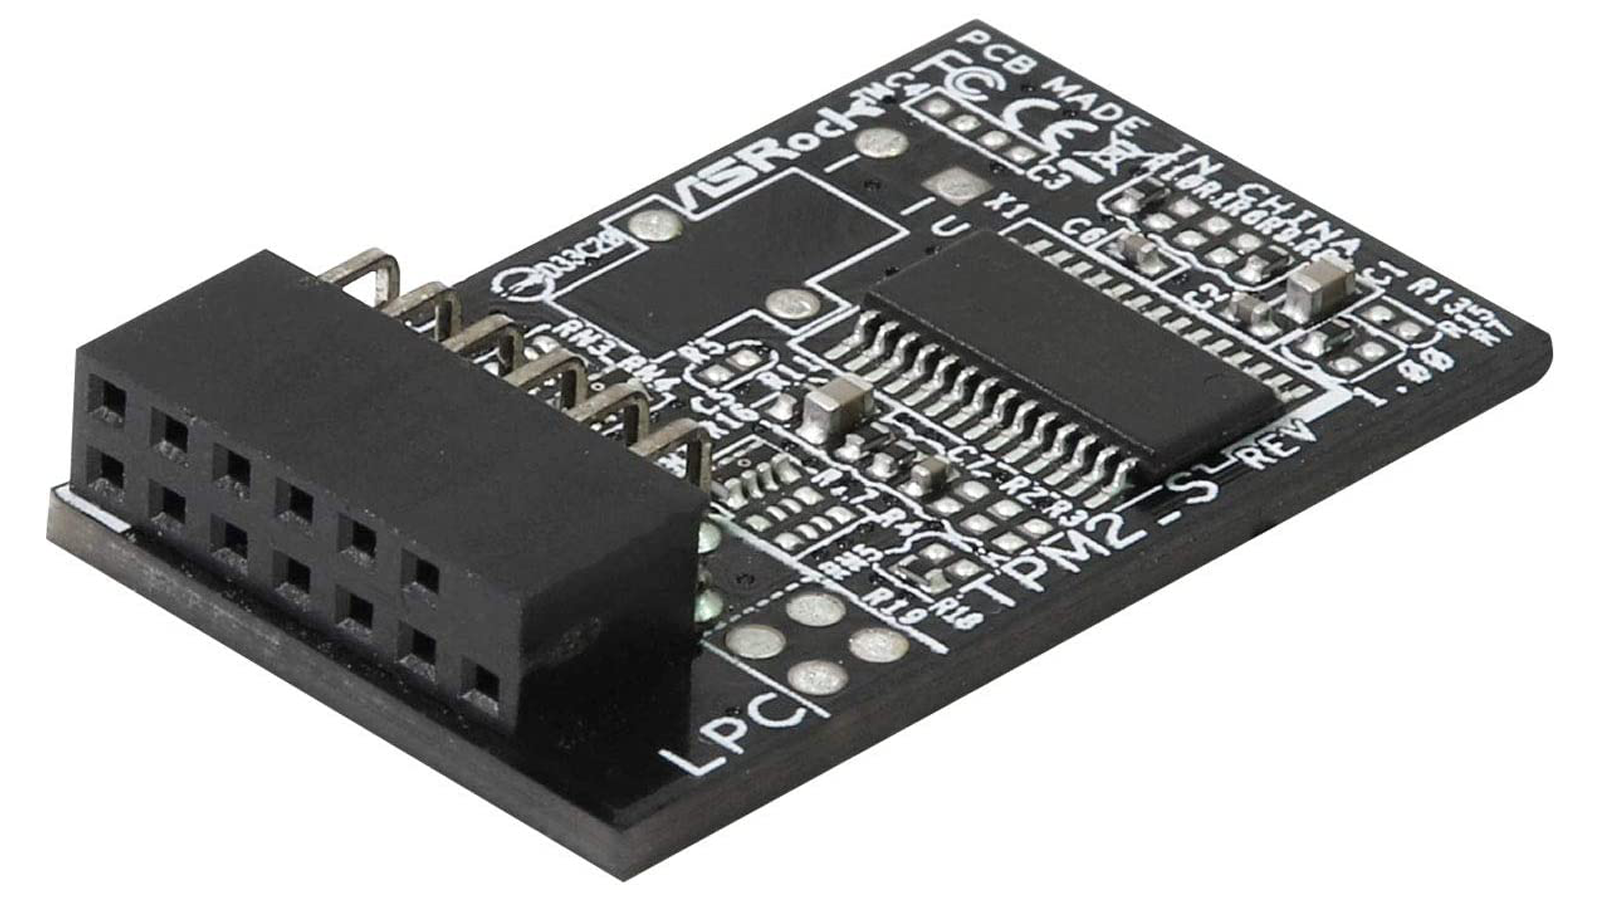 ASRock TPM2-S TPM Module Motherboard